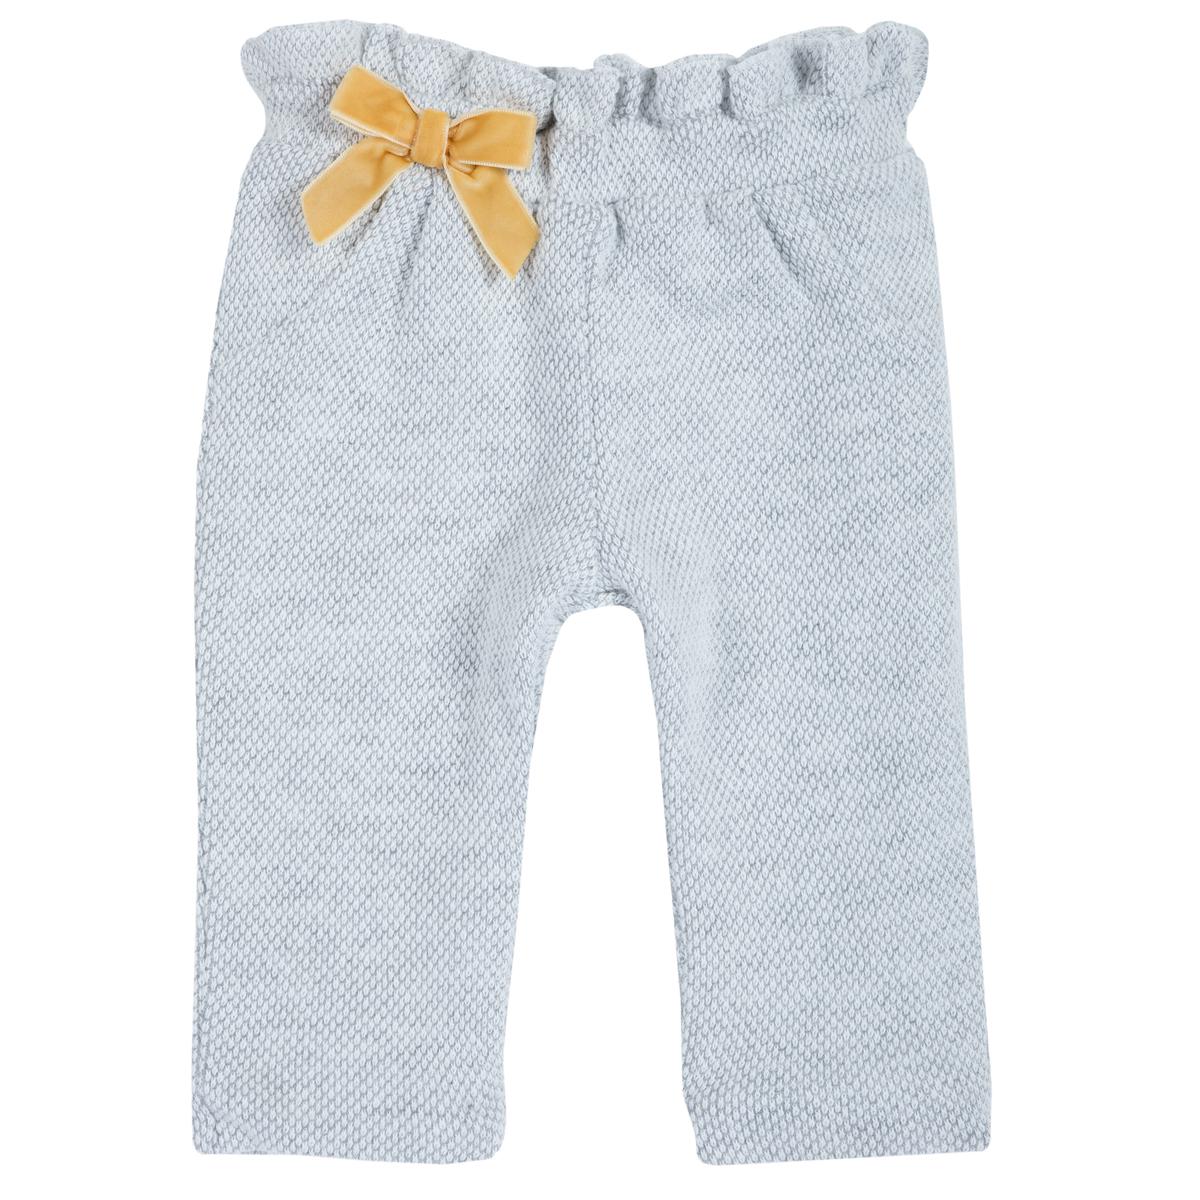 Pantaloni lungi copii Chicco, fundita galbena, 94768 din categoria Pantaloni copii